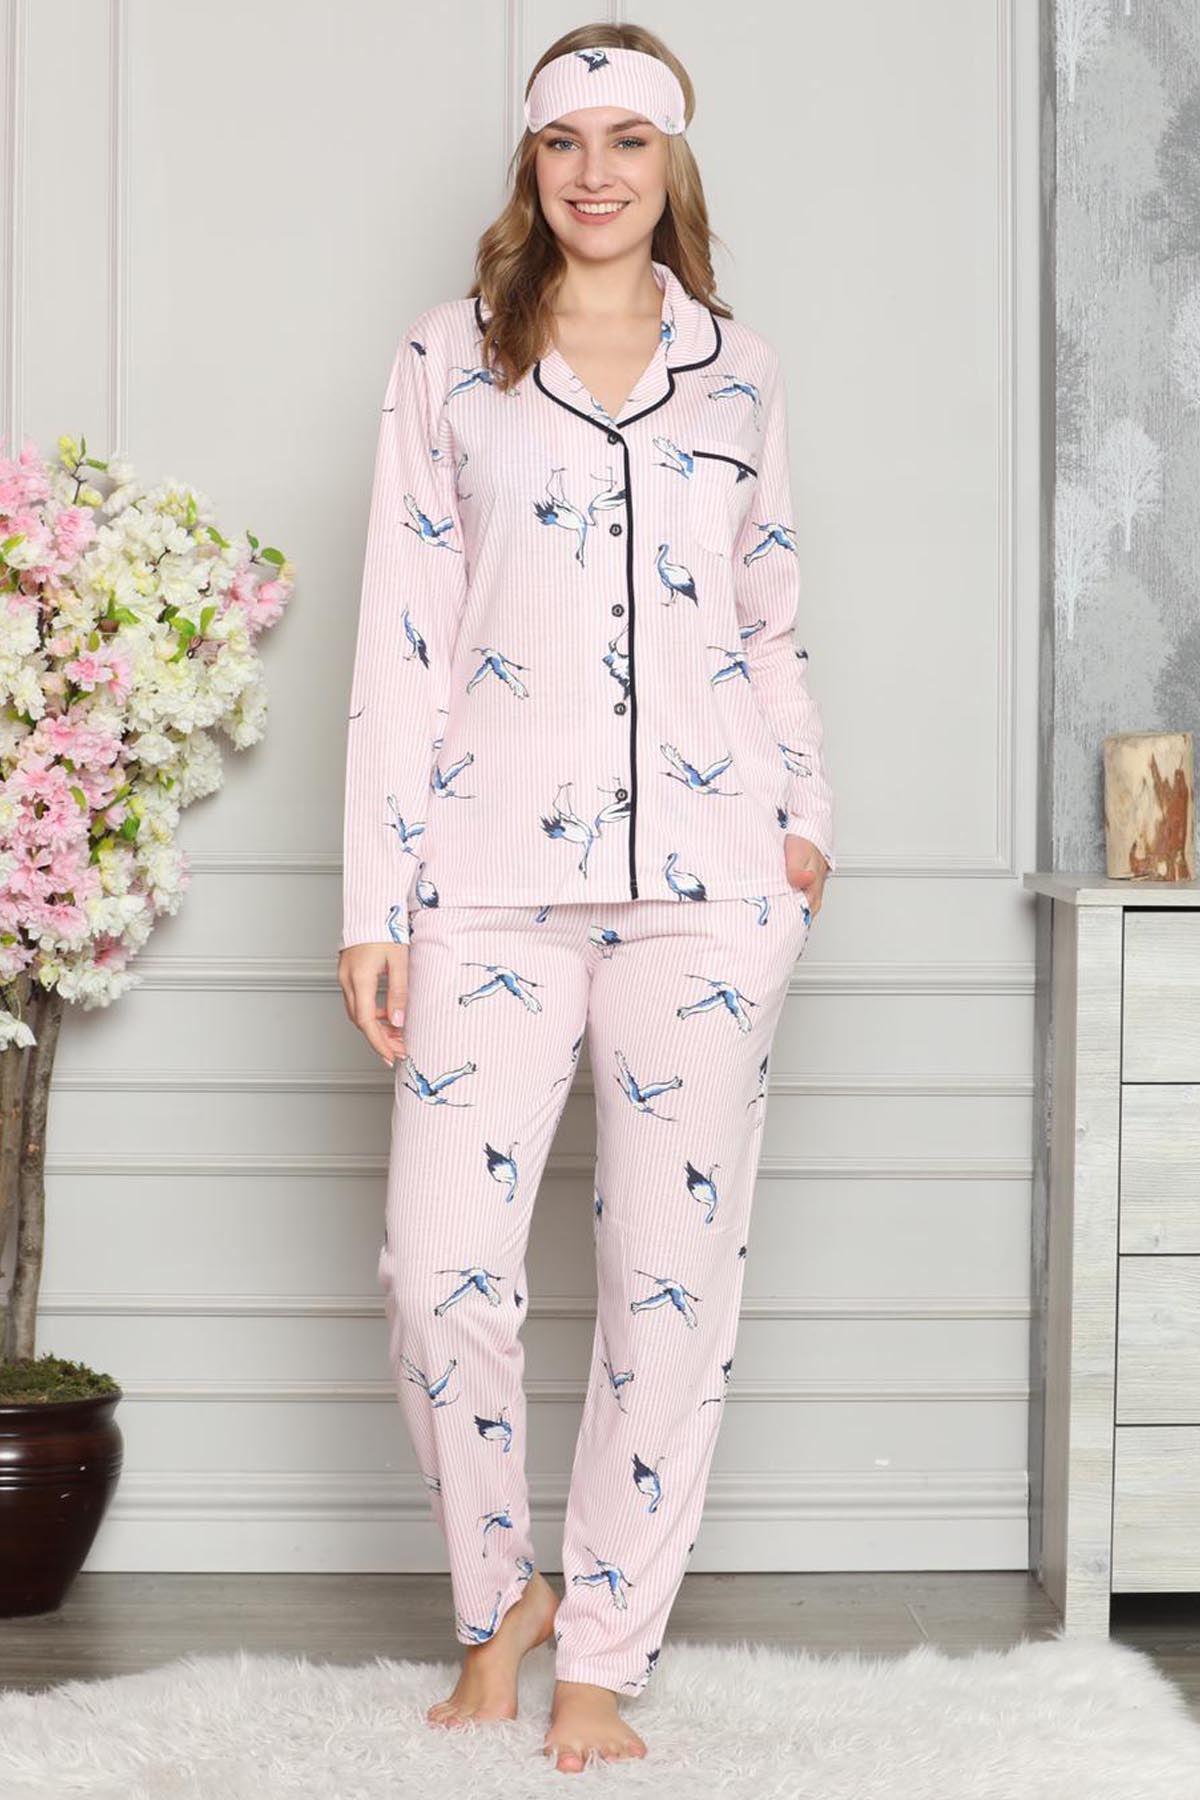 Pembe Beyaz Düğmeli Penye Pijama Takımı 8C-20508P